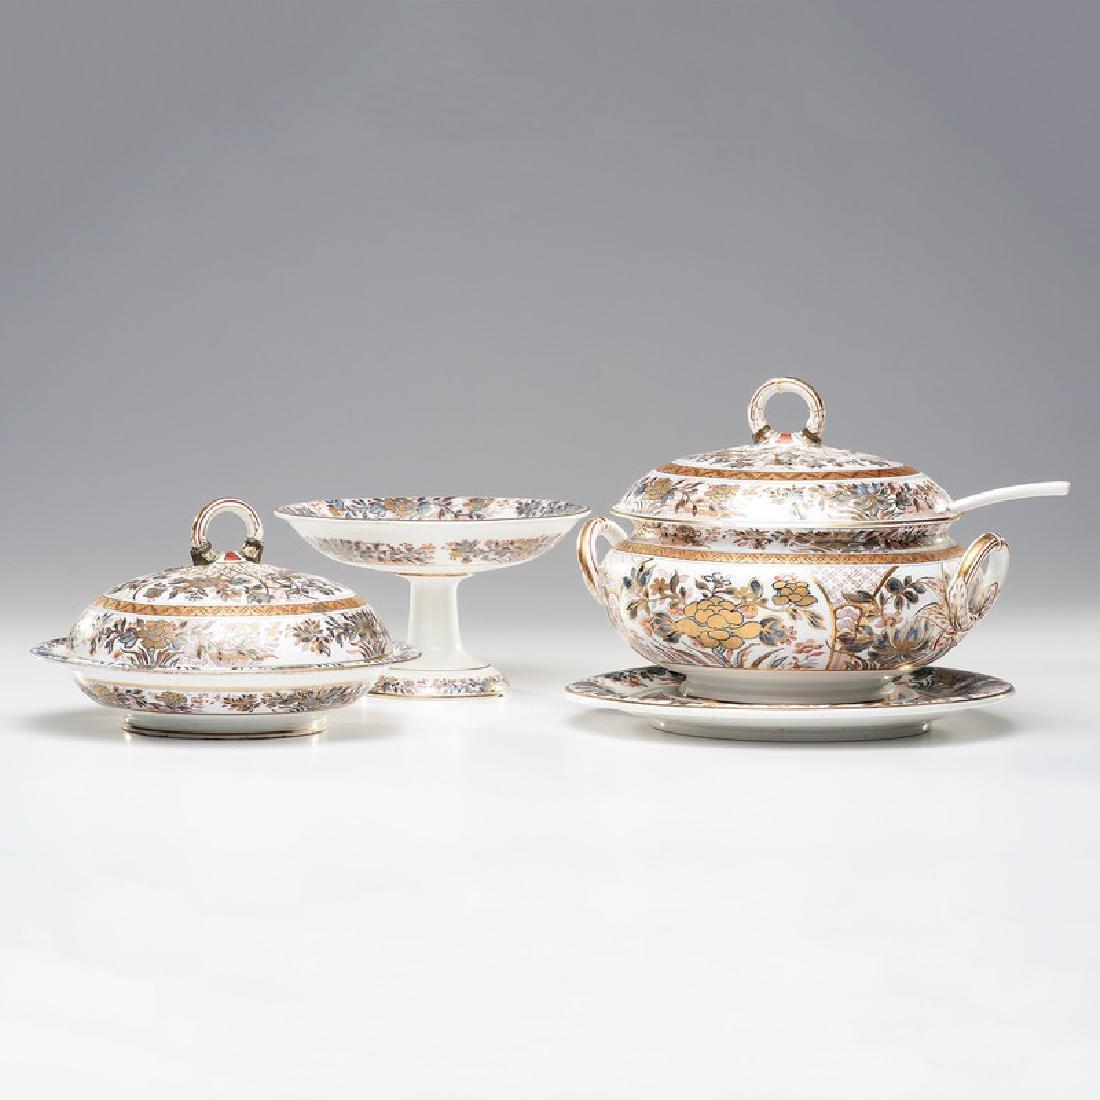 Wedgwood Table Wares in Ningpo Pattern, Plus